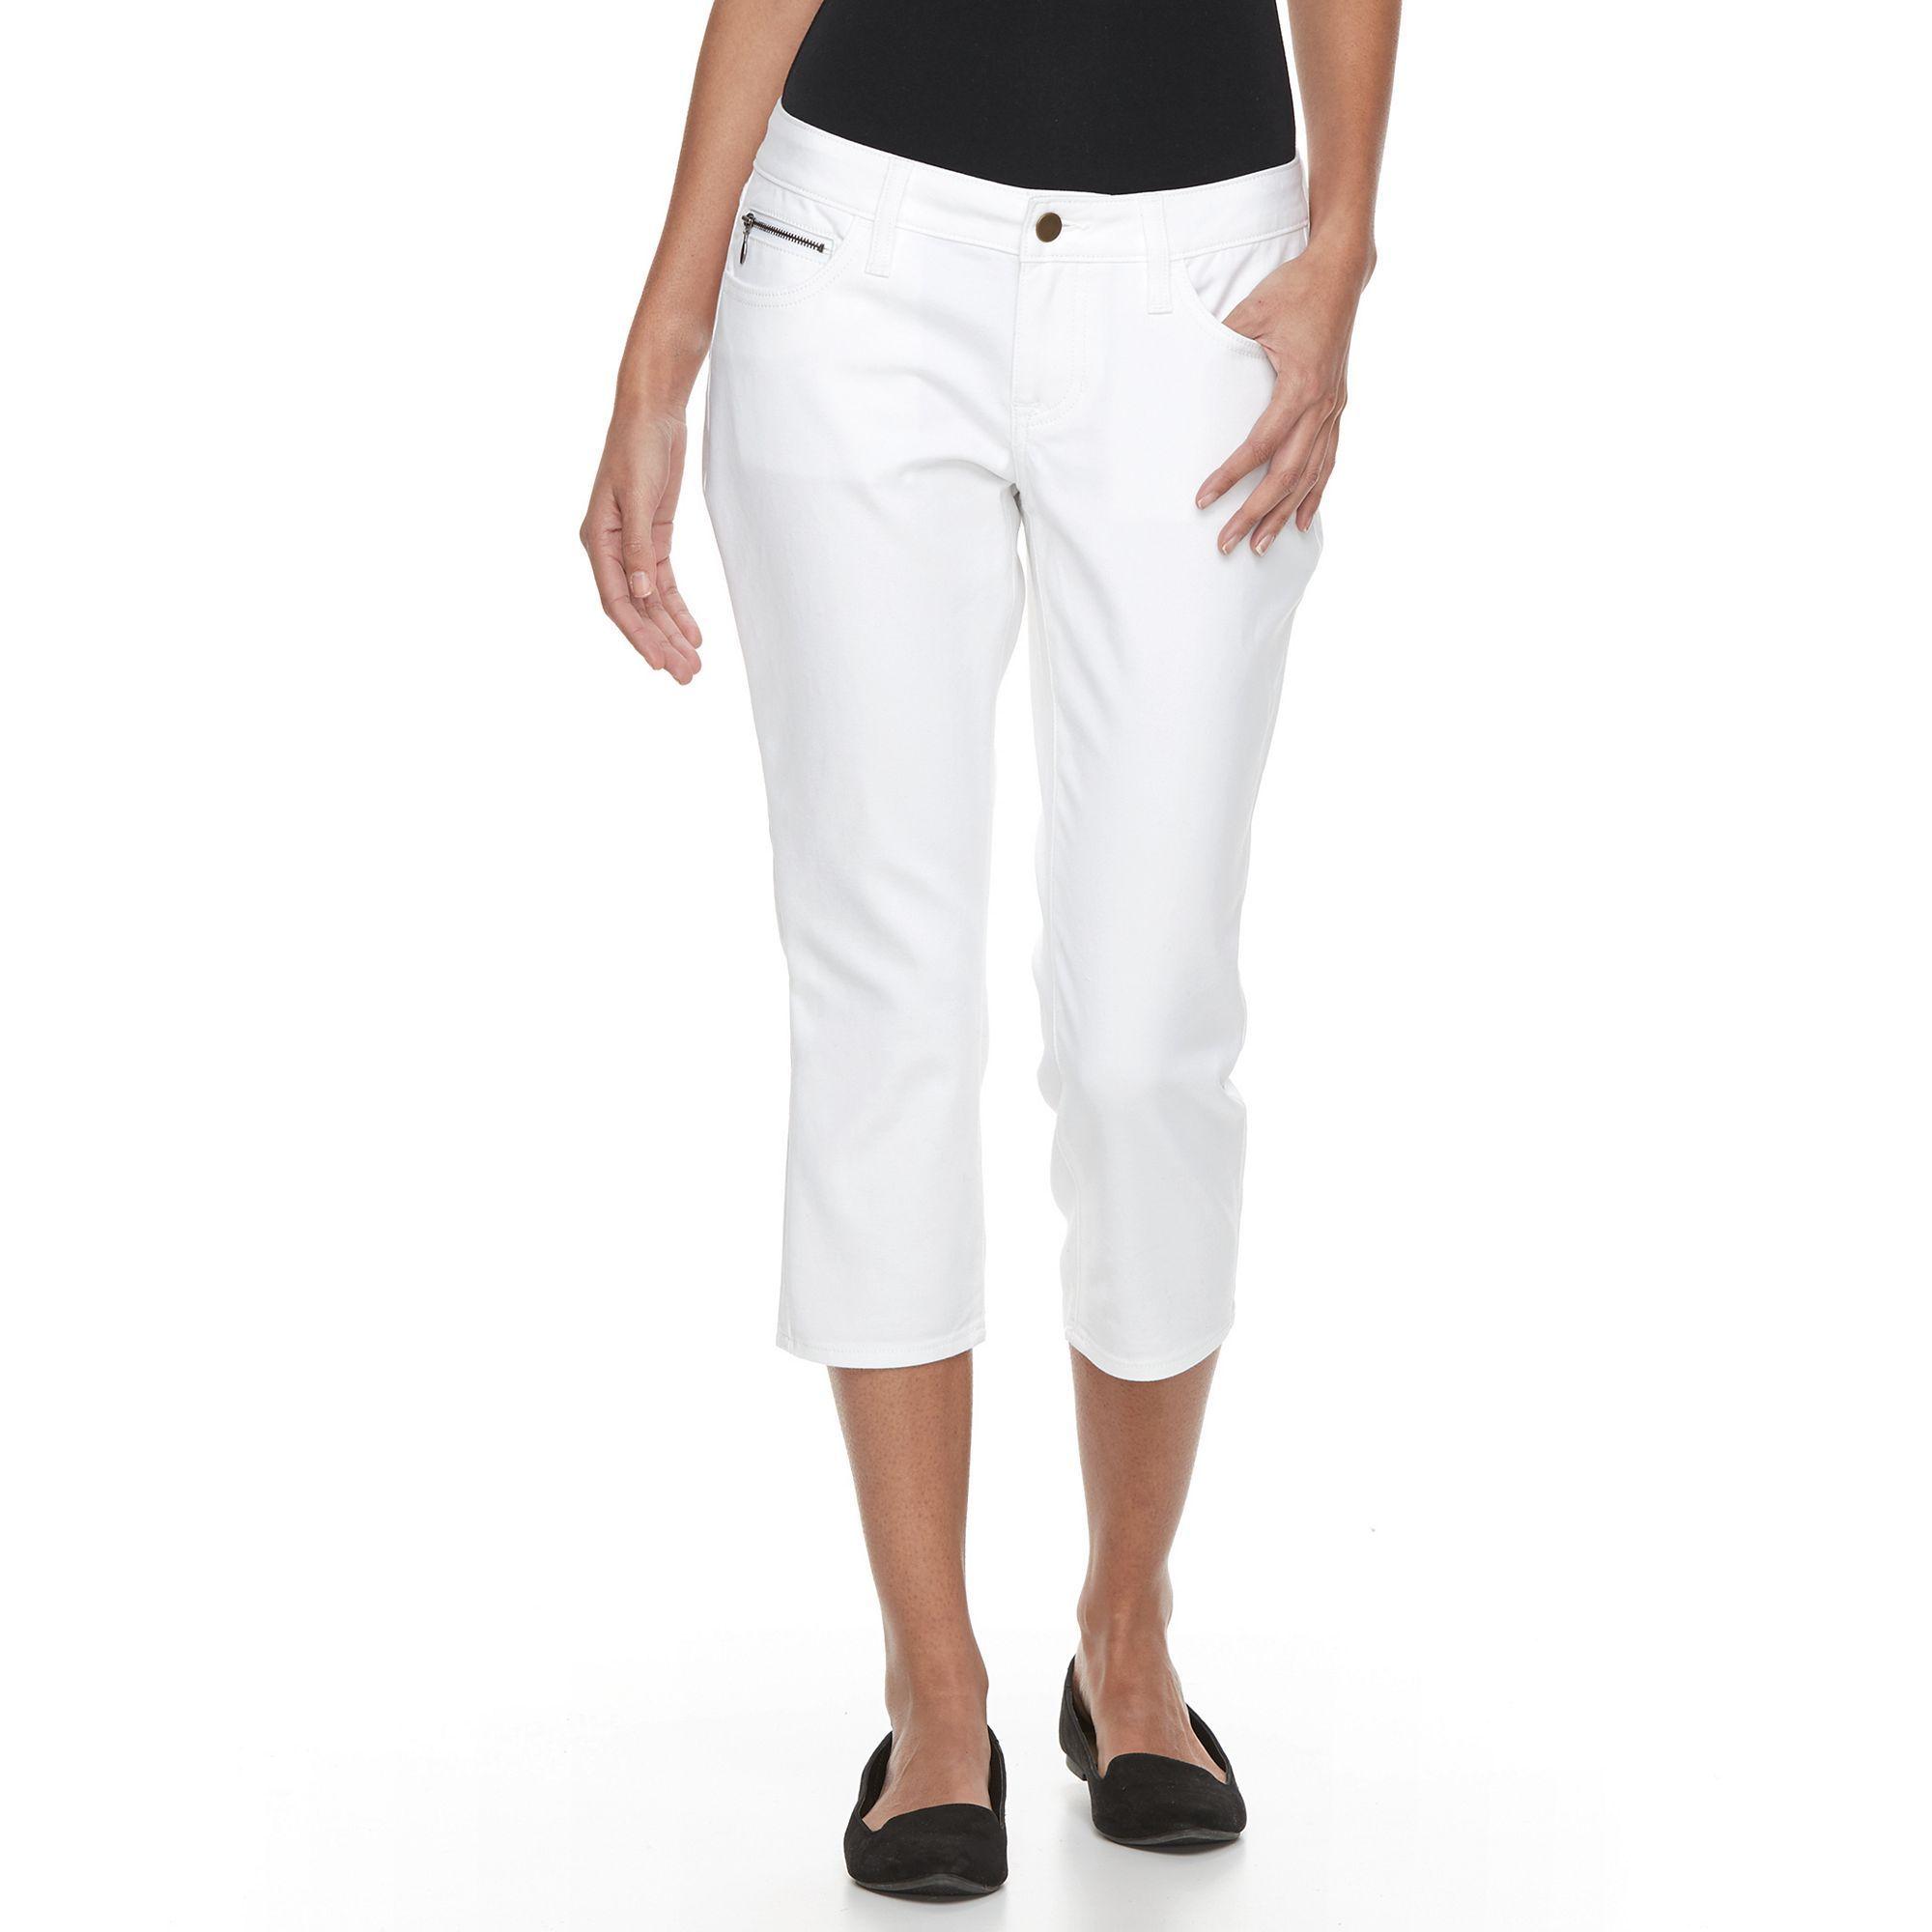 Apt. 9® Modern Fit Skinny Capris, Women's, Size: 16 Petite, White